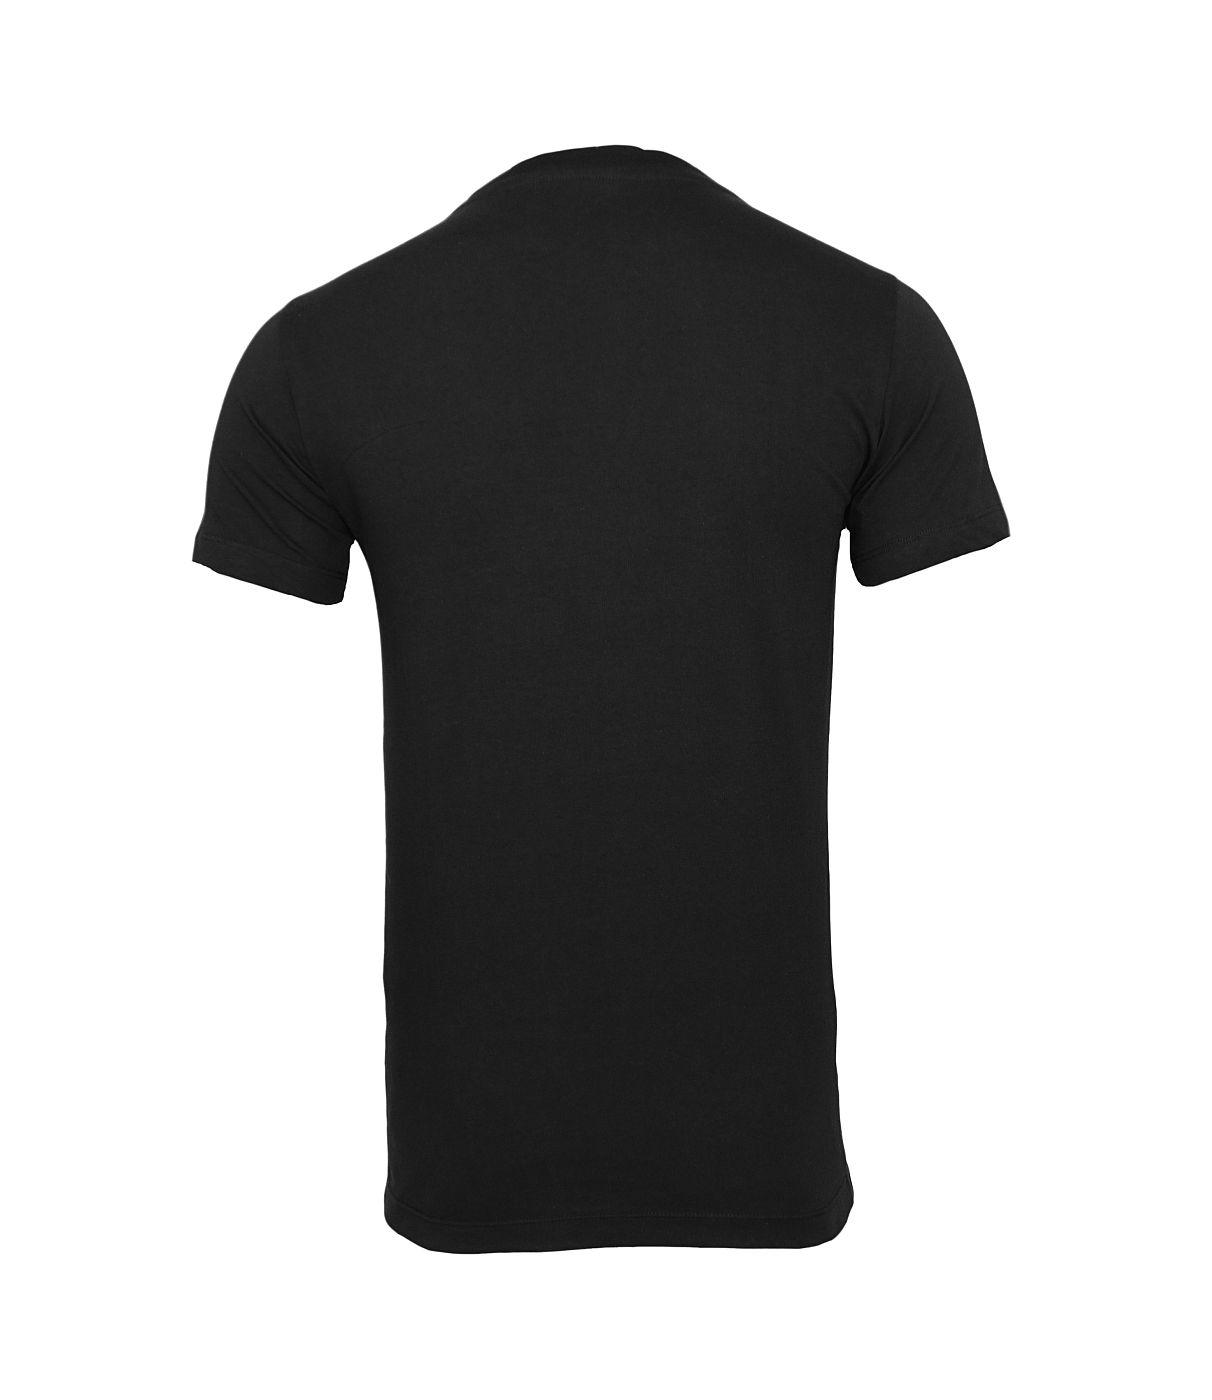 Replay 2er Pack T-Shirts Rundhals M3588 22602 020 black S18-RPT1